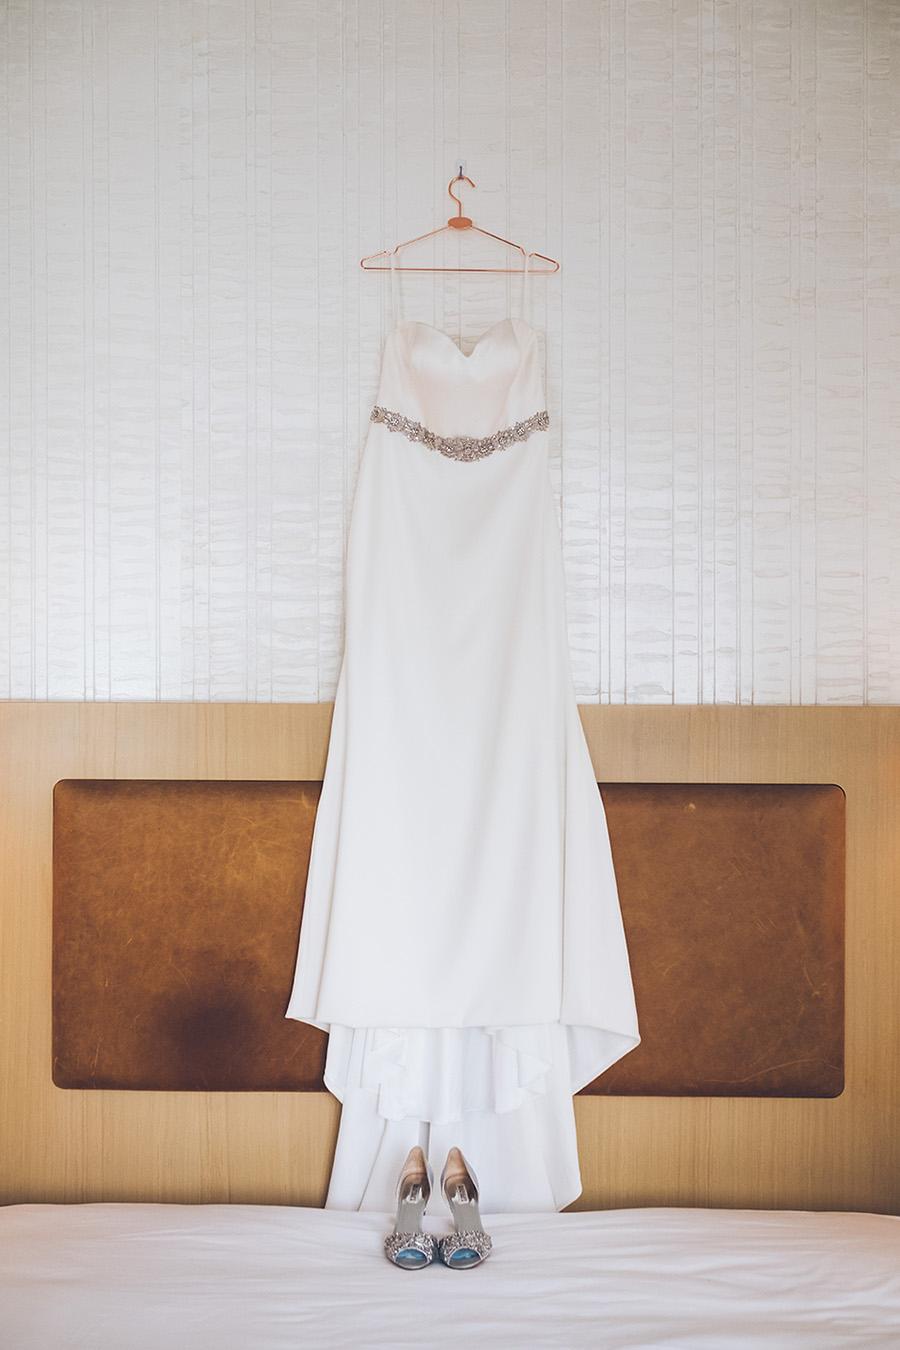 CHARISSE-AARON-NYC-WEDDING-CYNTHIACHUNG-DETAILS-0030.jpg